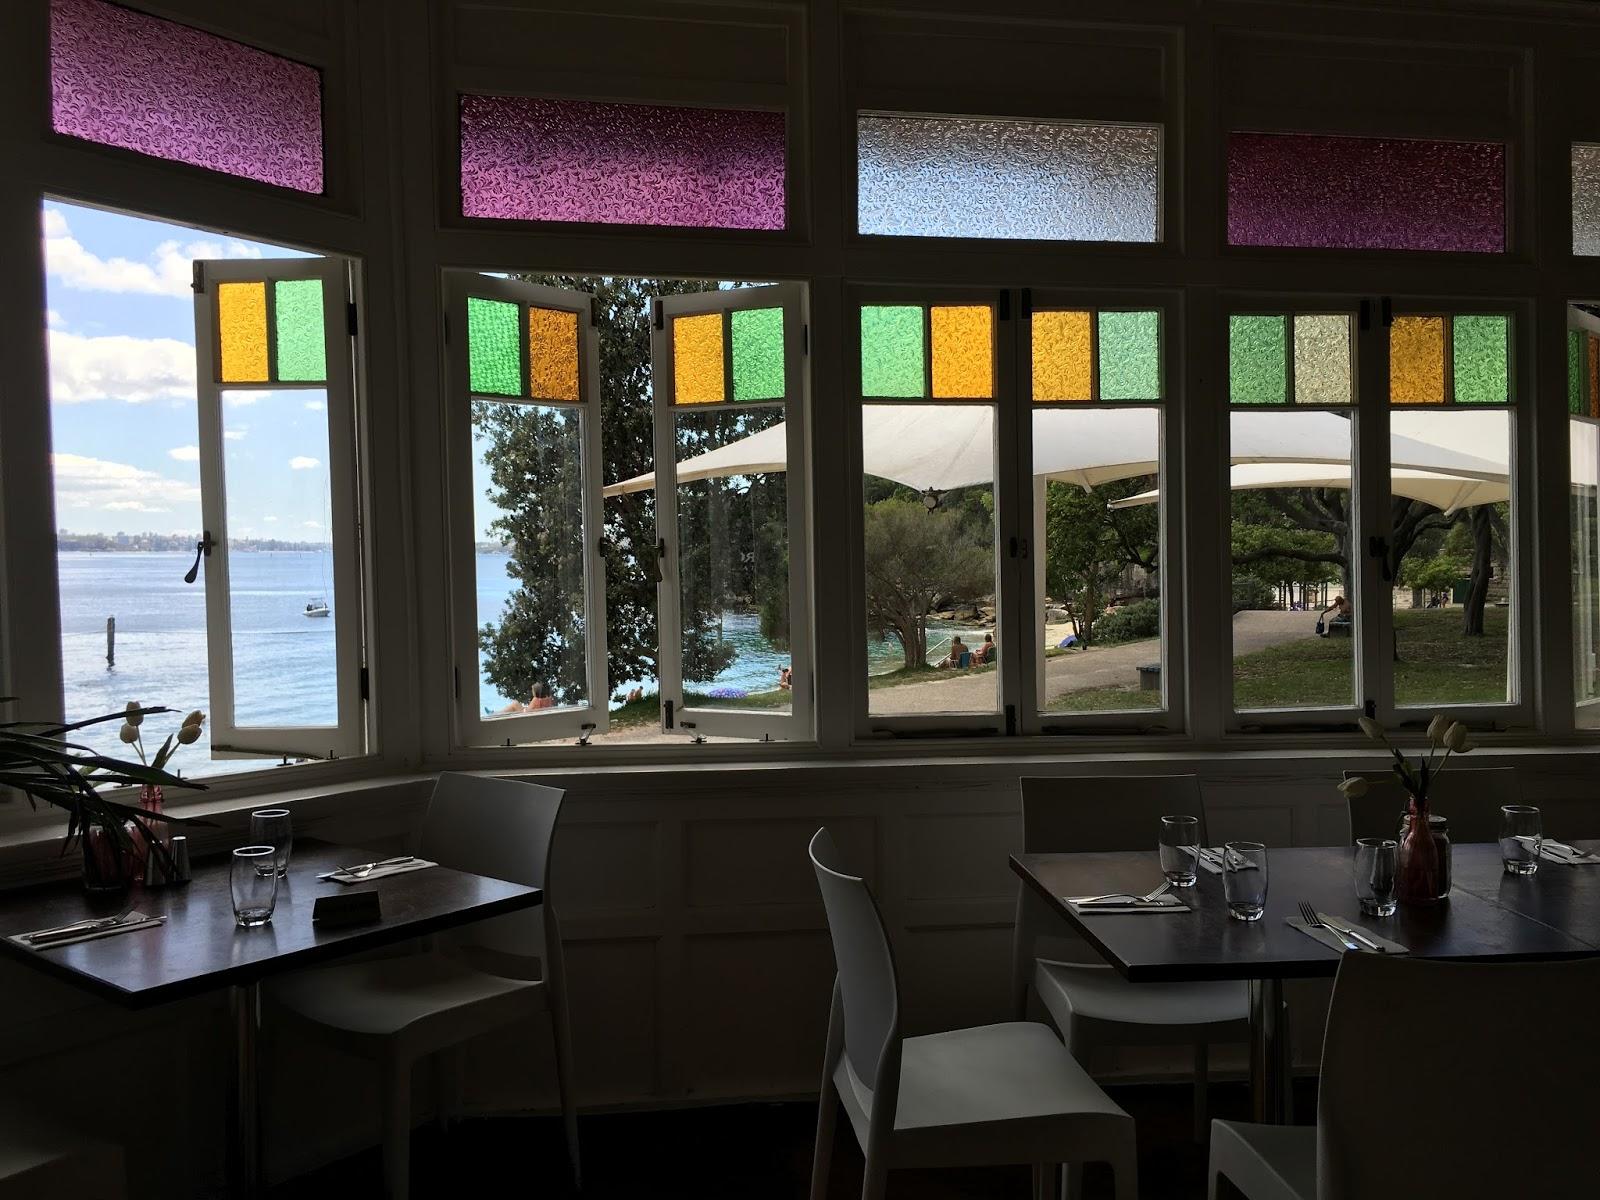 Sydney Daily Photo Nielsen Park Cafe And Restaurant